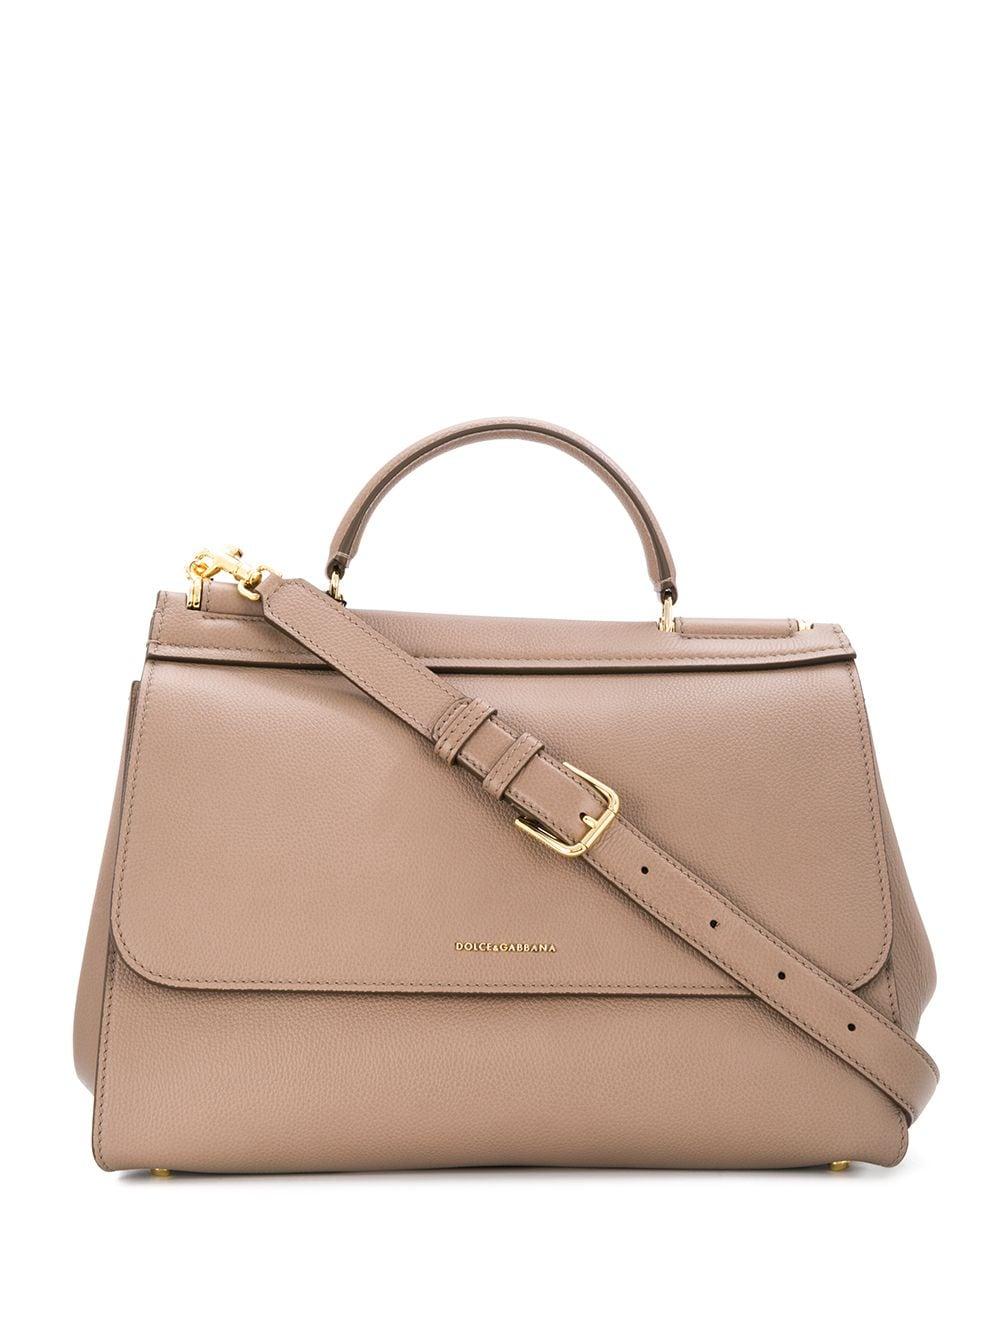 Medium Miss Sicily Leather Handbag